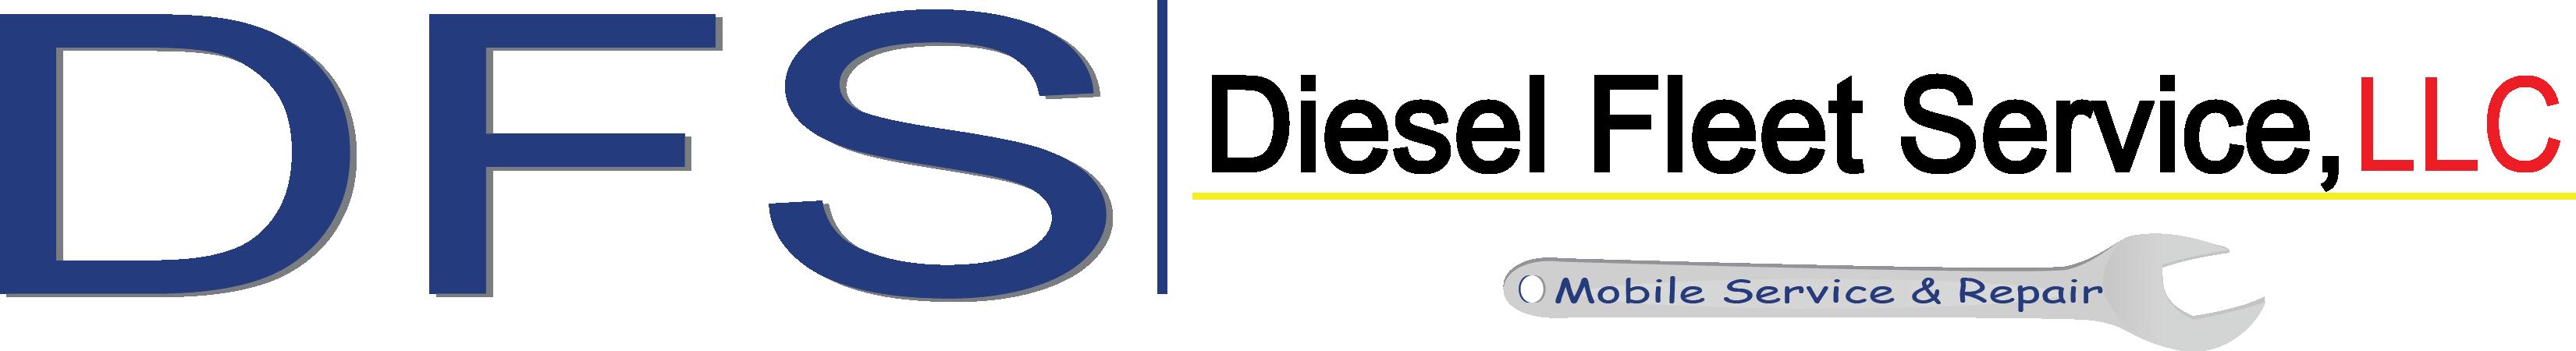 Logo Design by Smartweb - Entry No. 85 in the Logo Design Contest Artistic Logo Design for Diesel Fleet Service, LLC.